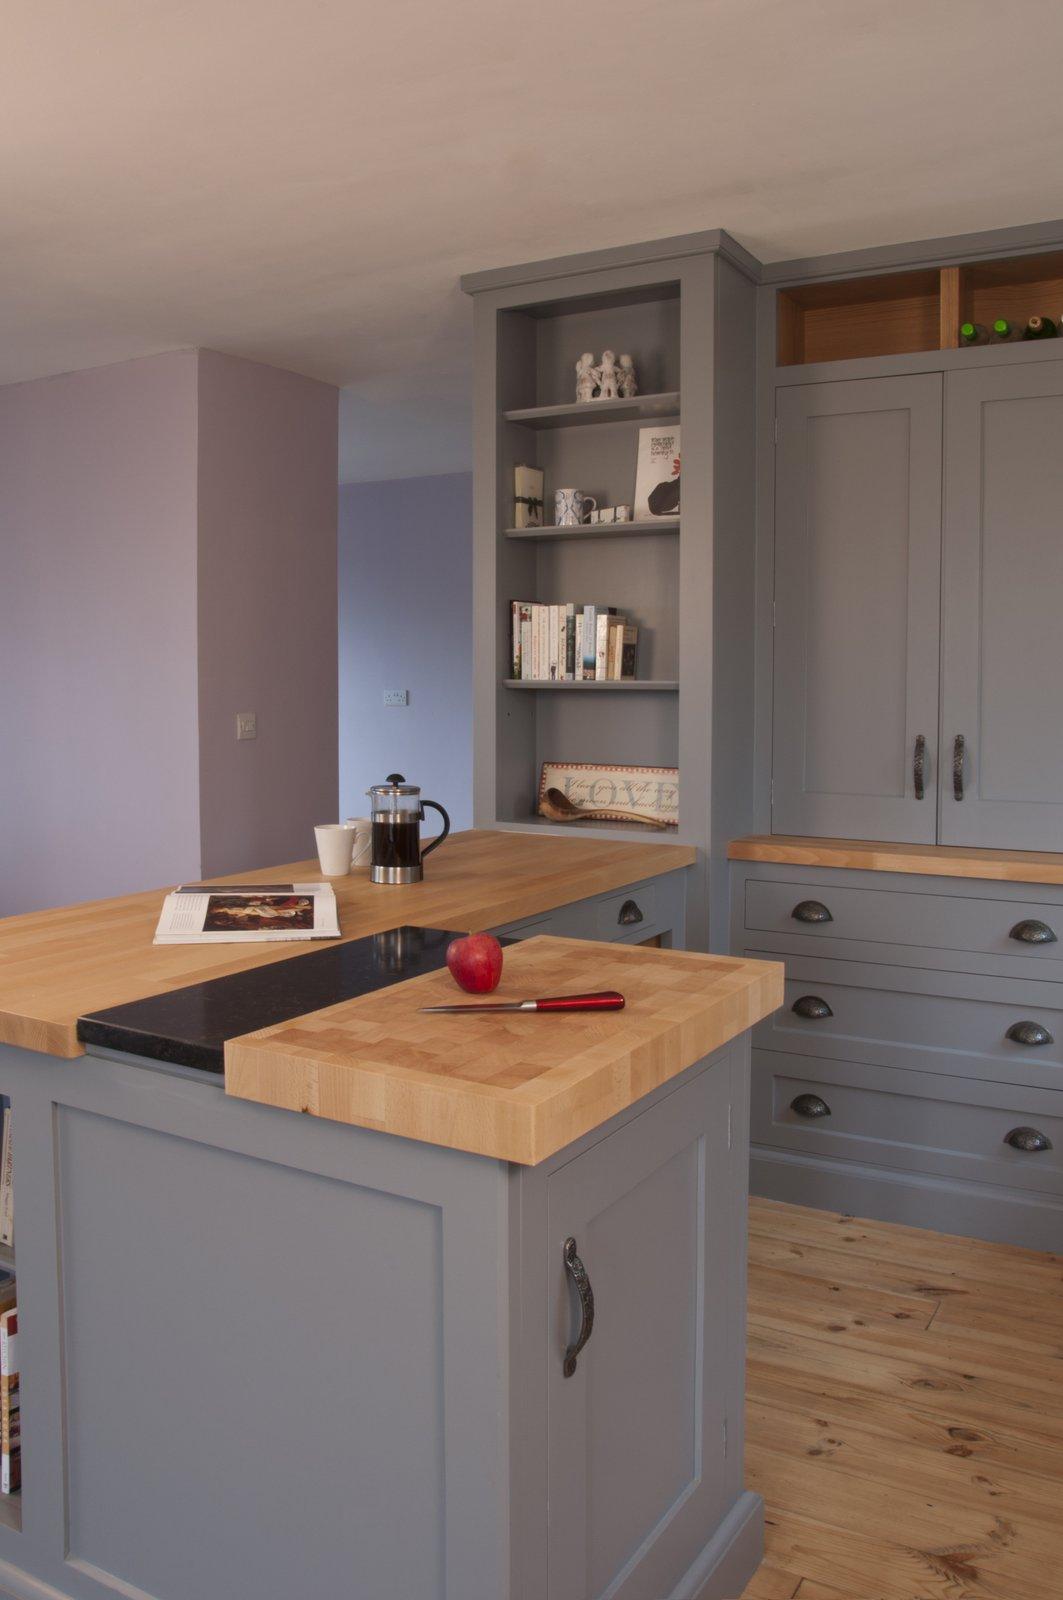 Talisman Woodworks - Handcrafted bespoke kitchen design